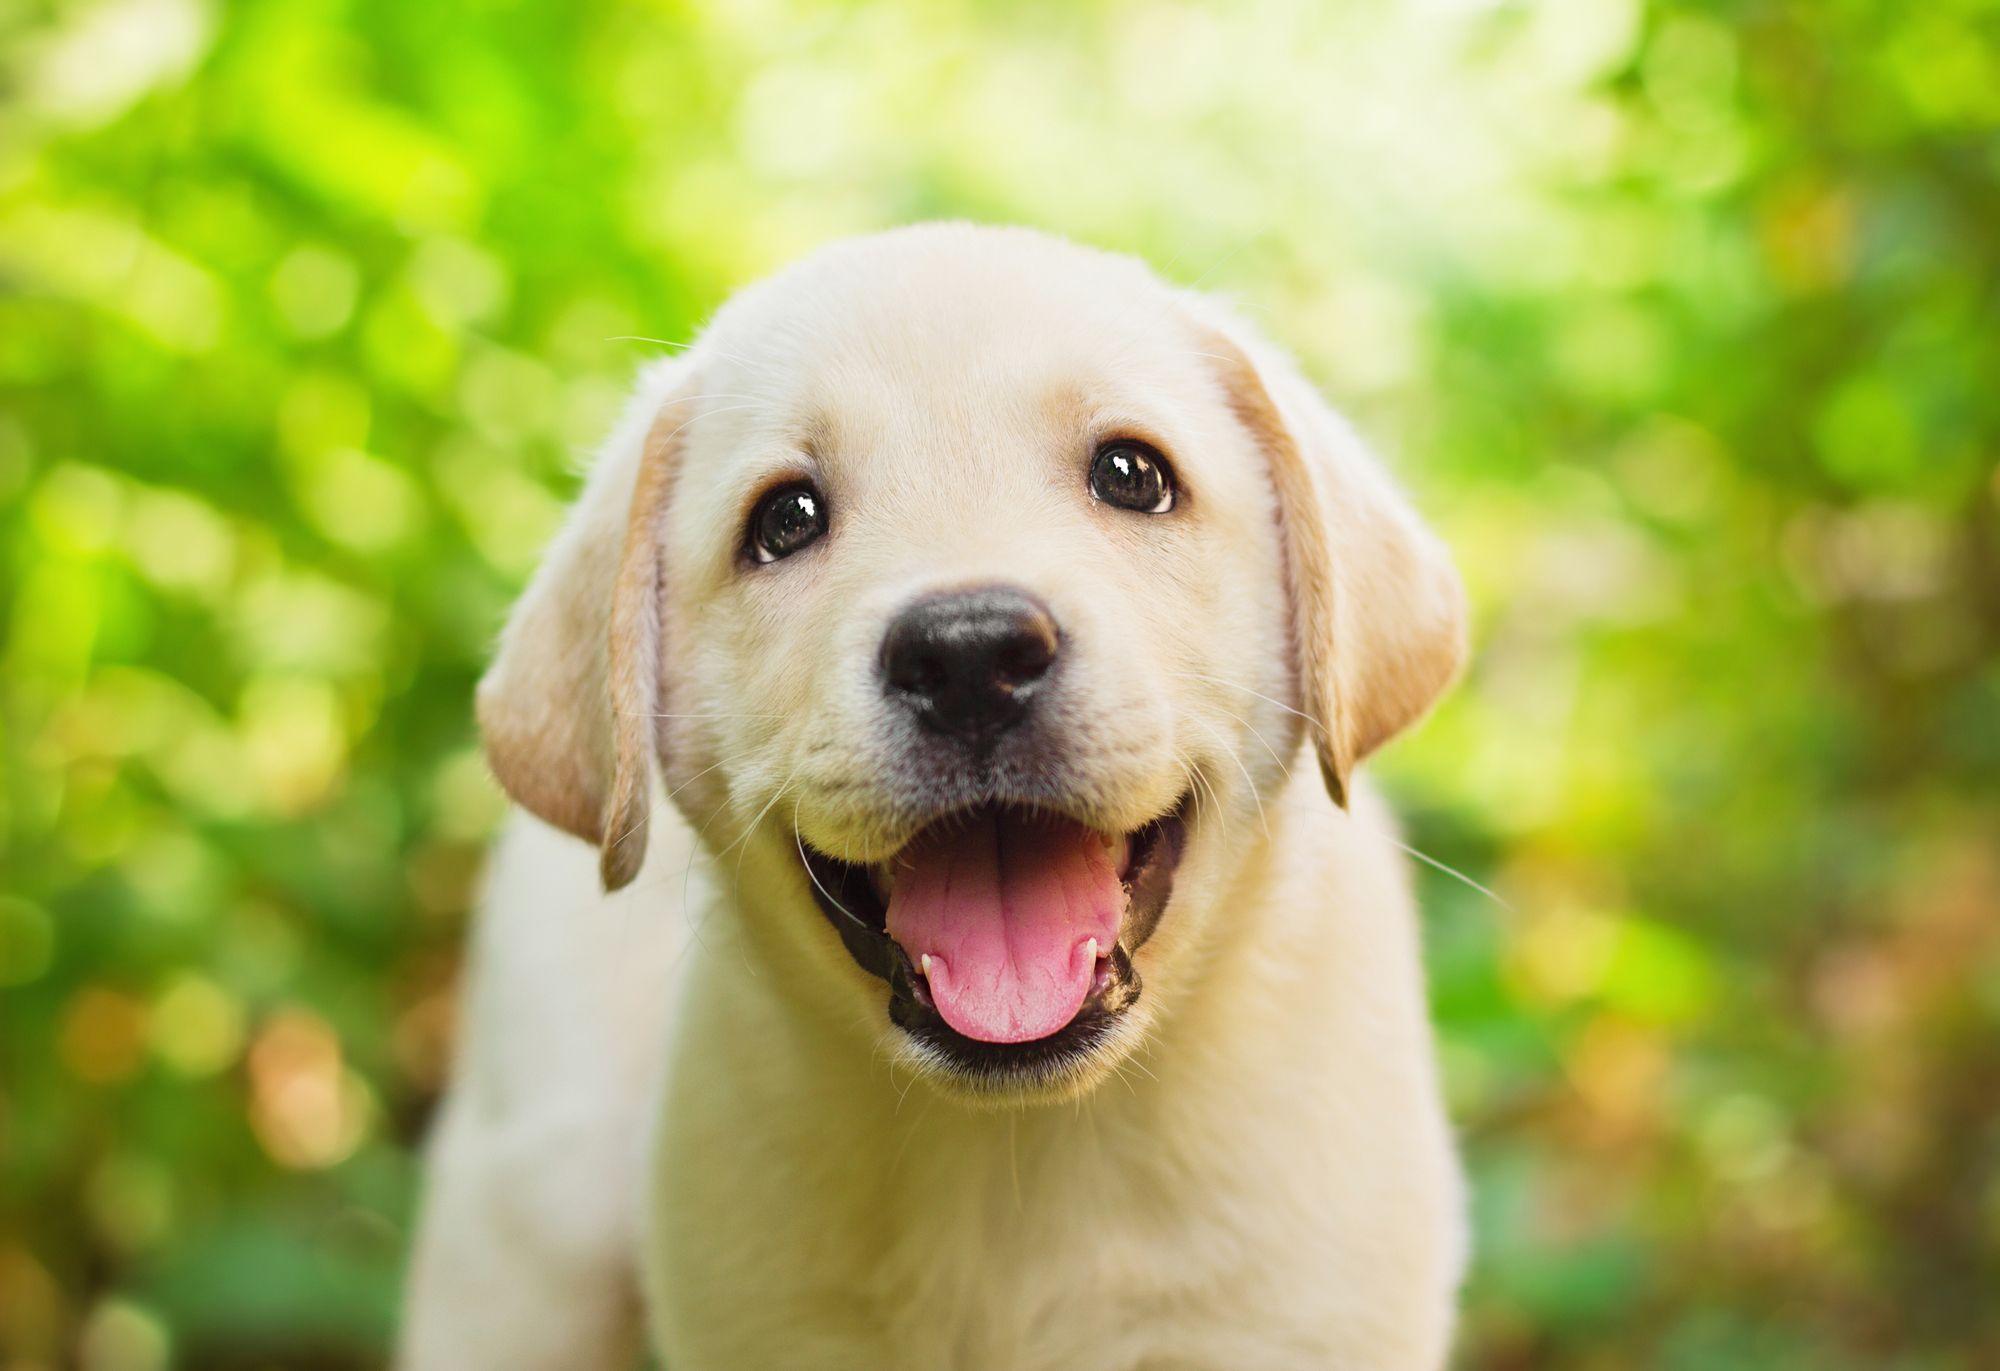 10 Cutest Dog Breeds